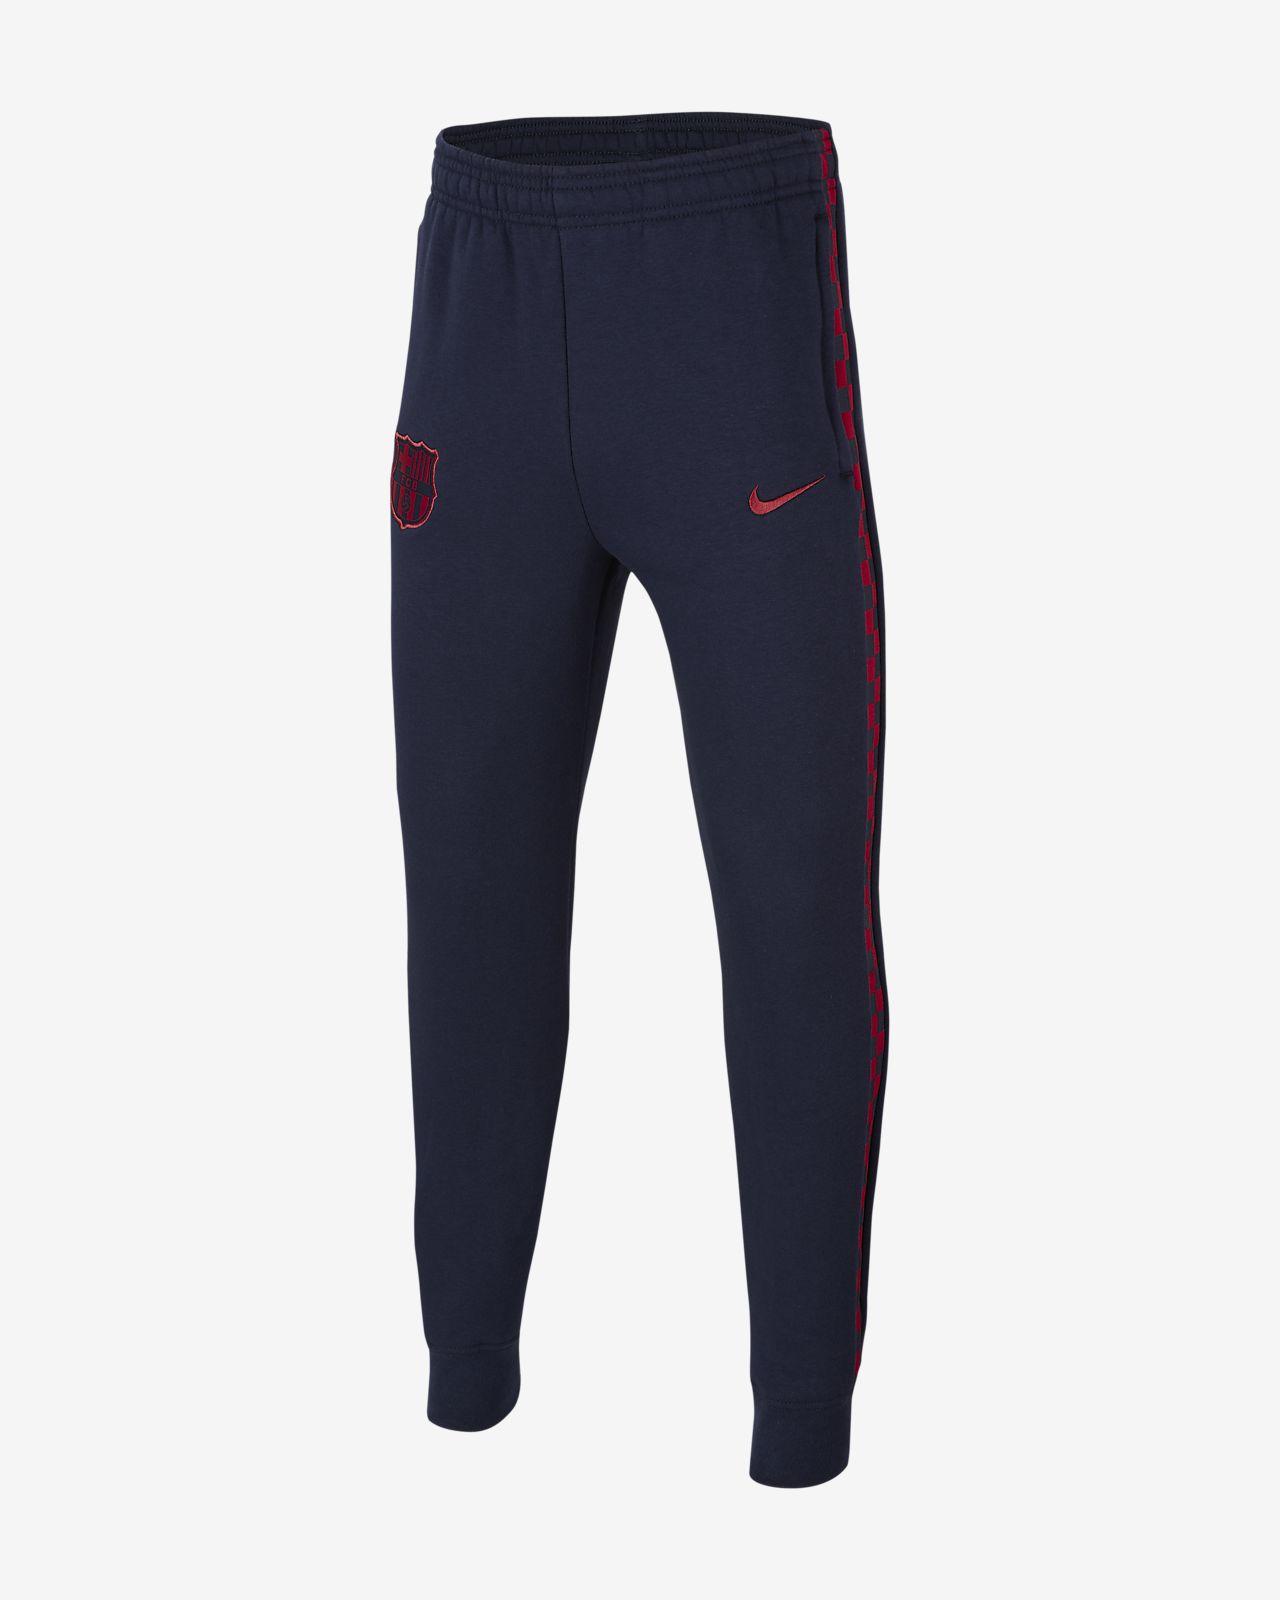 FC Barcelona Older Kids' Fleece Pants